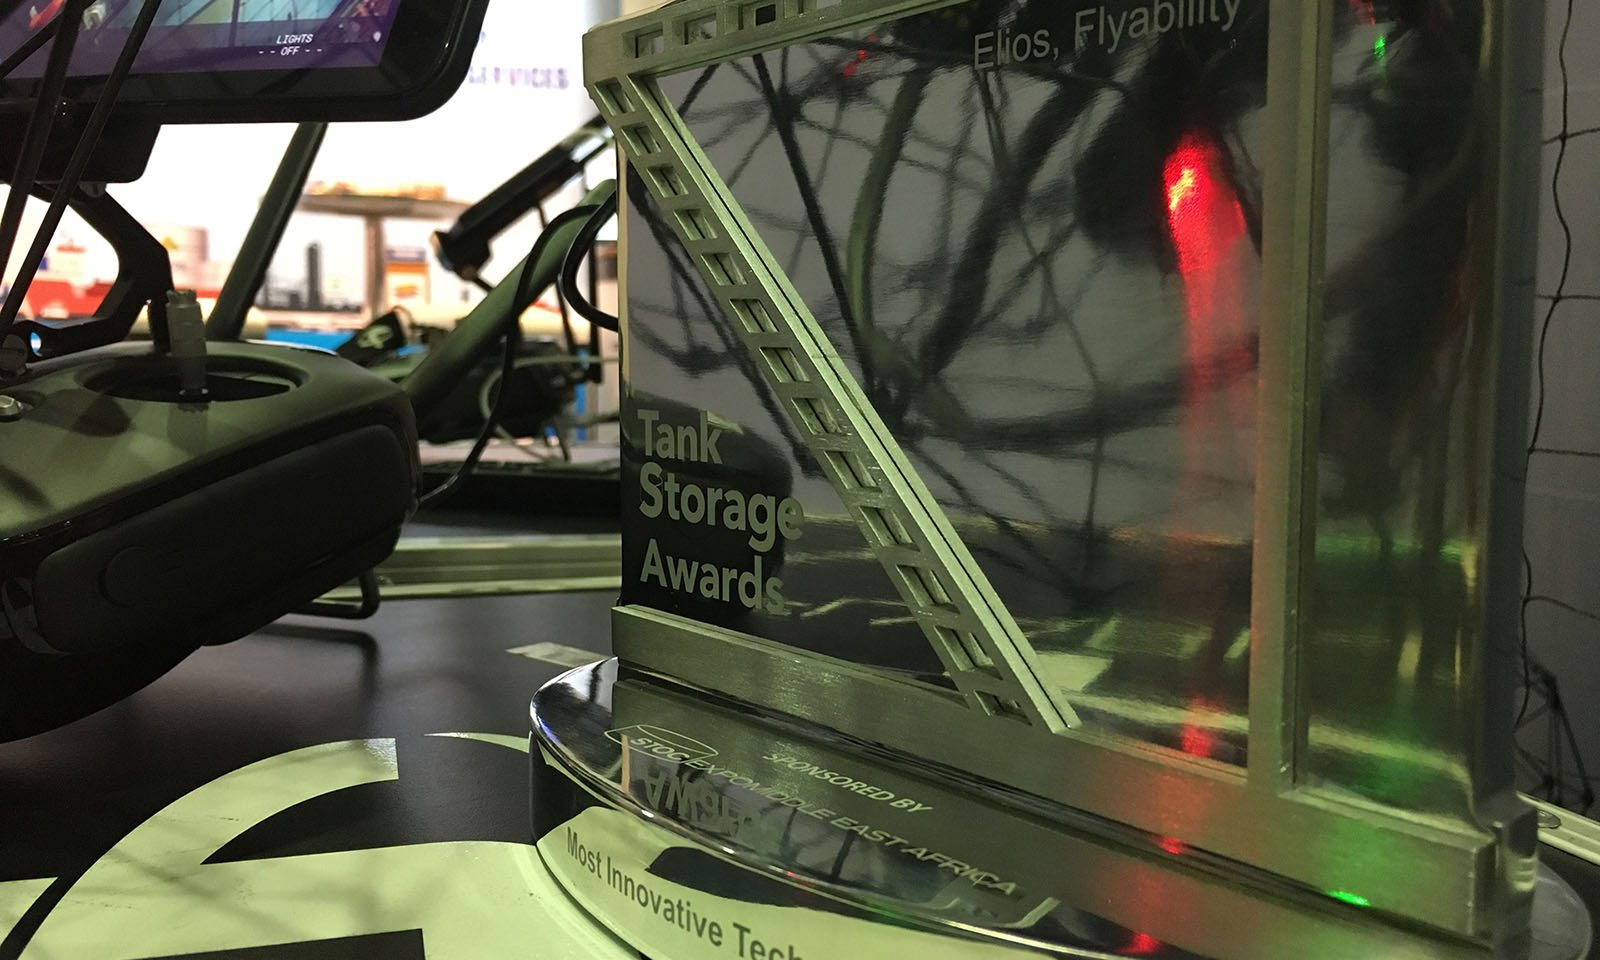 Flyability Awarded Most Innovative Technology by the Bulk Storage Industry